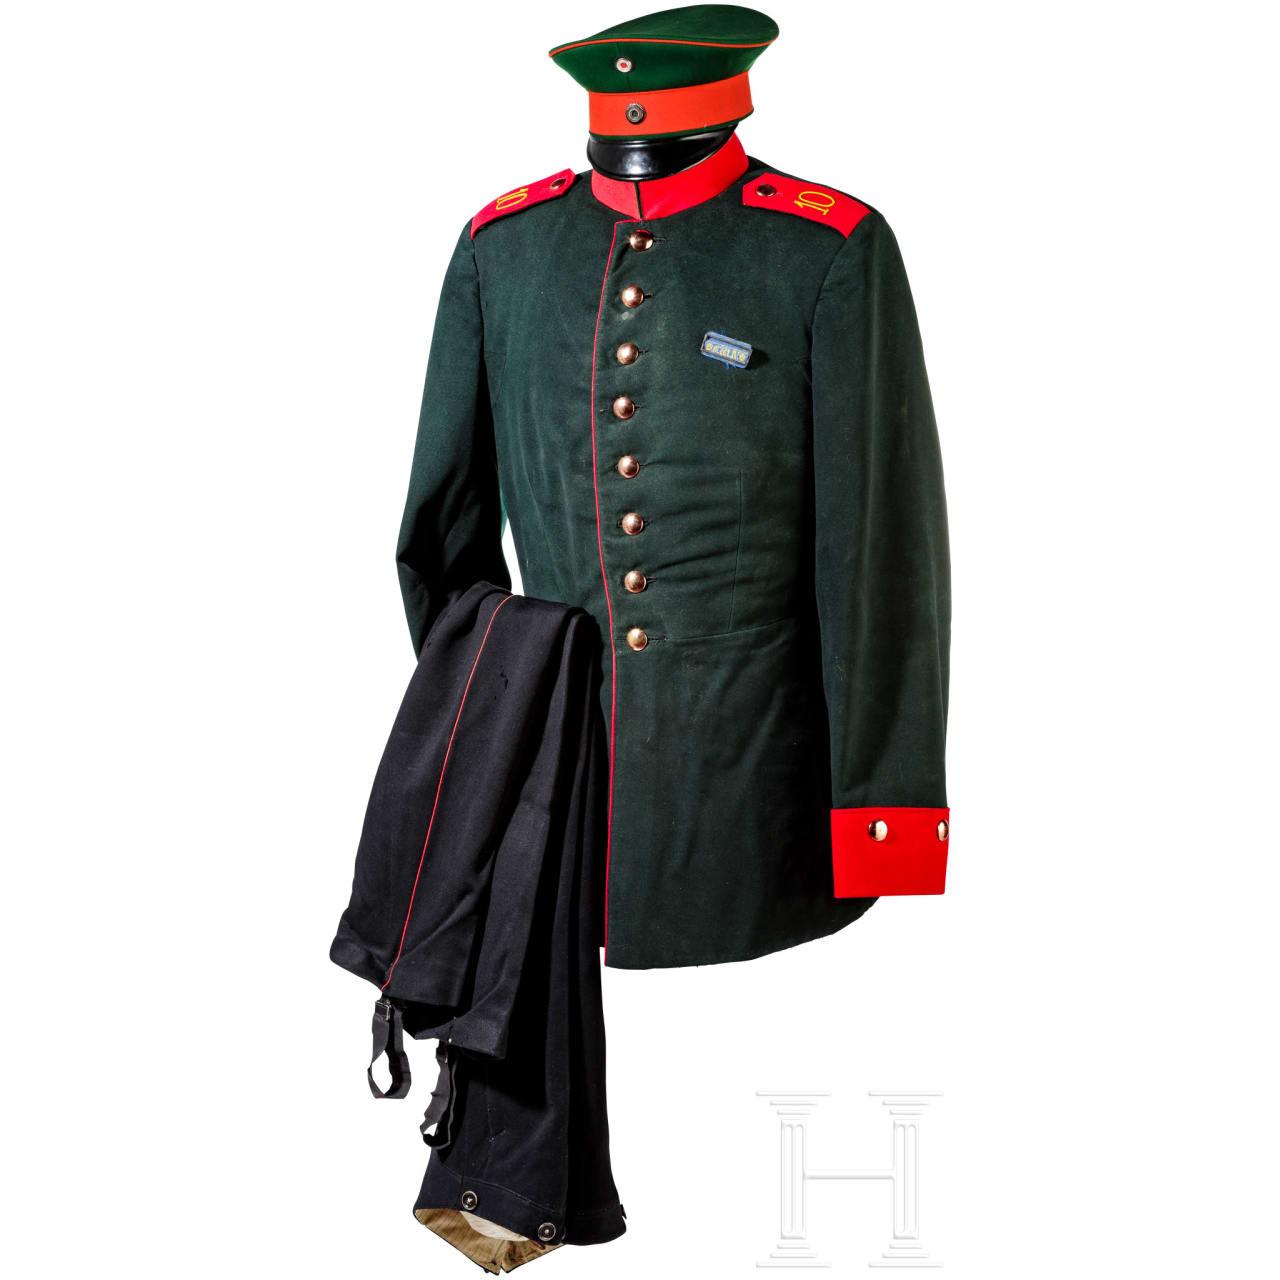 Uniform parts of the Hanoverian Hunter Battalion No. 10 and a knapsack